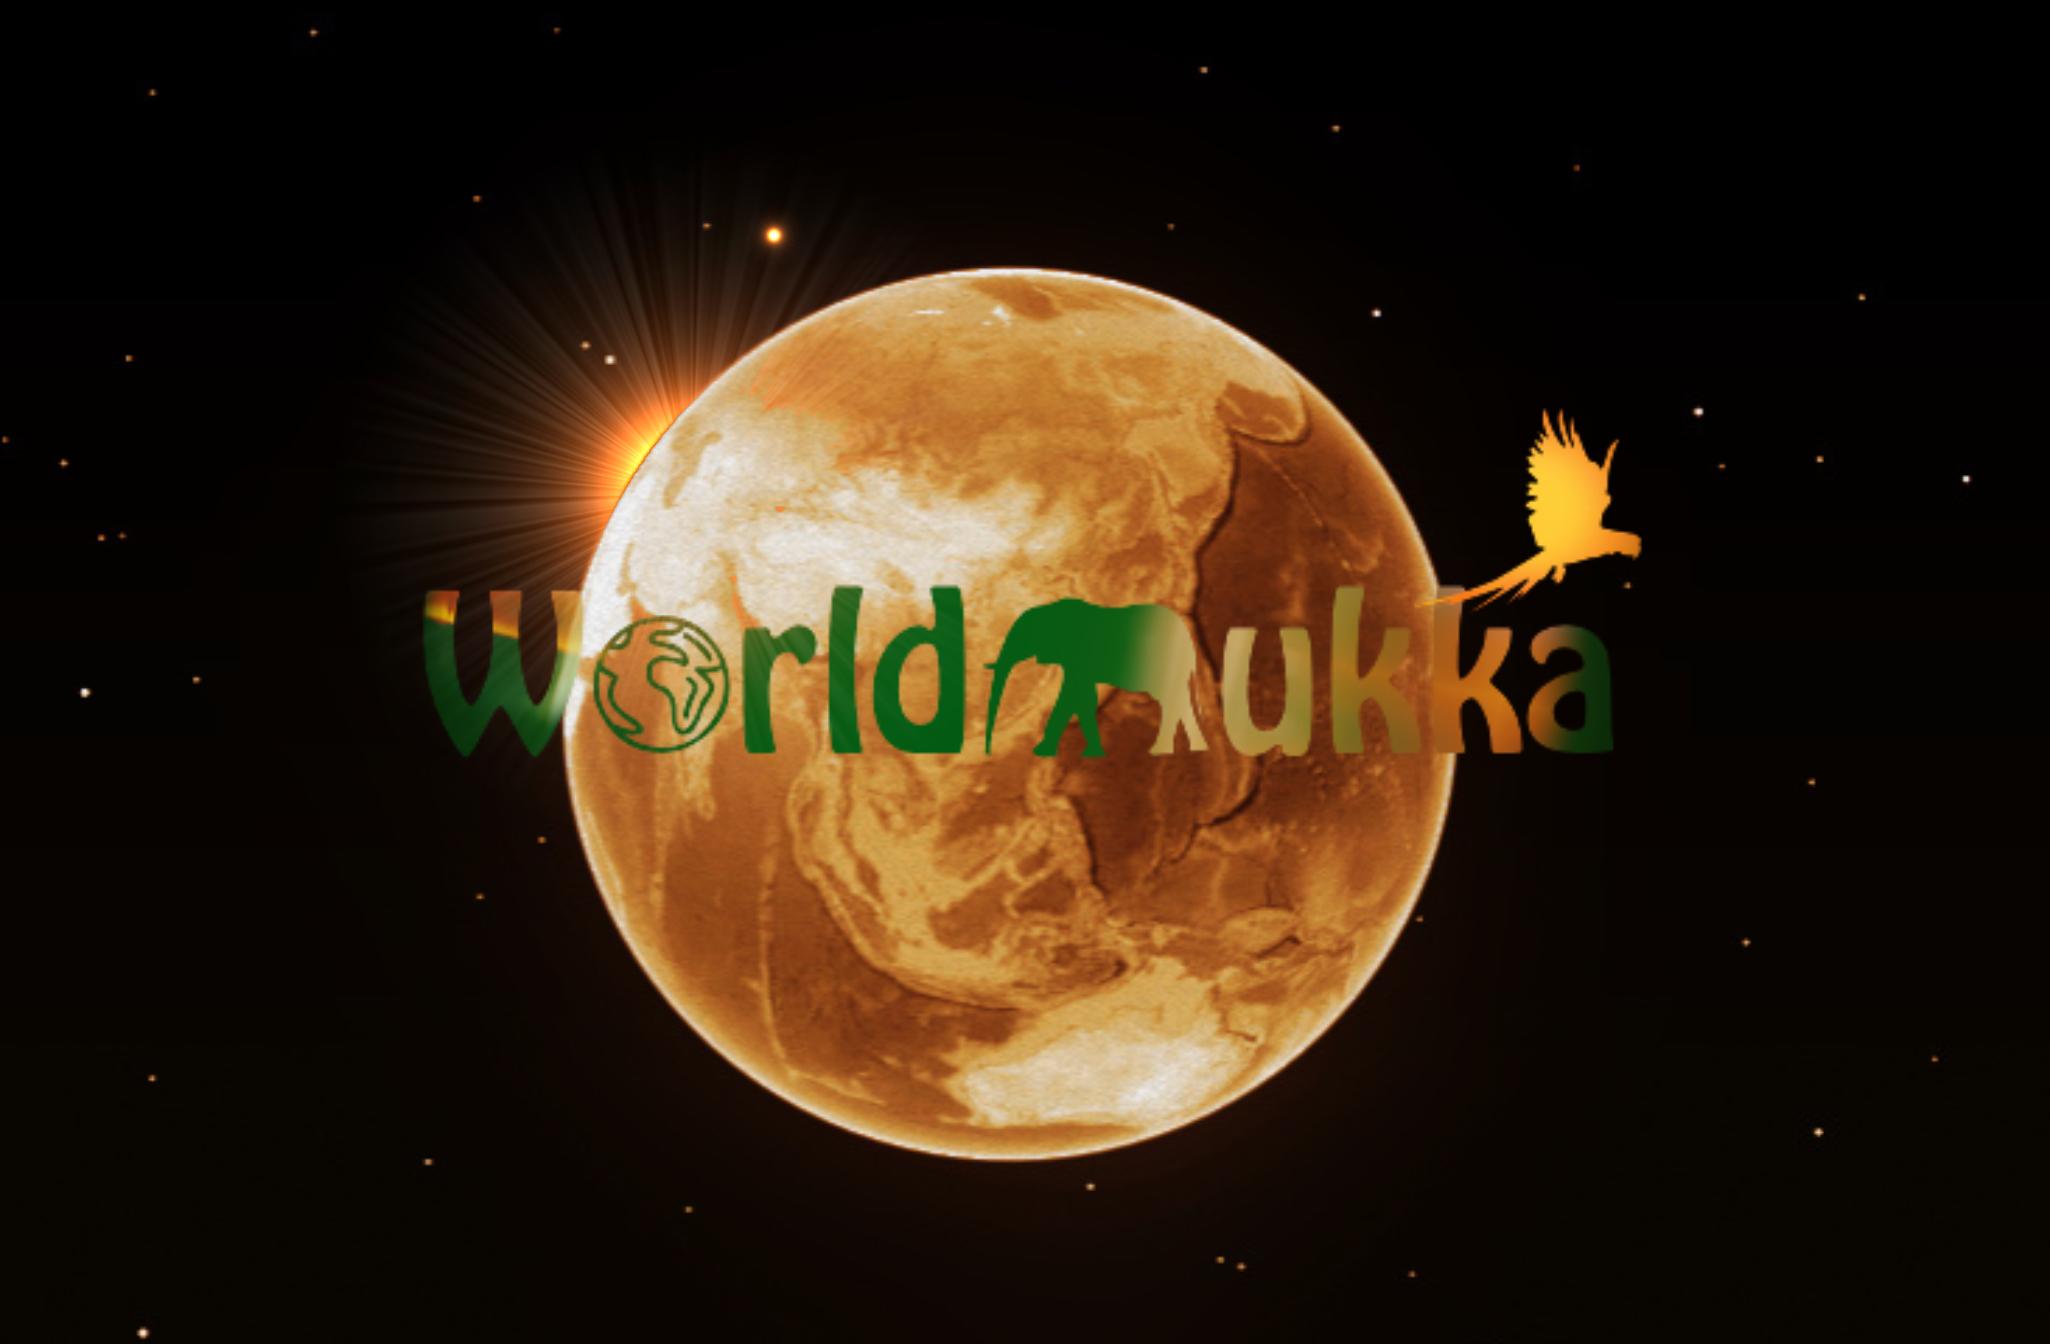 Worldmukka-AddLogo